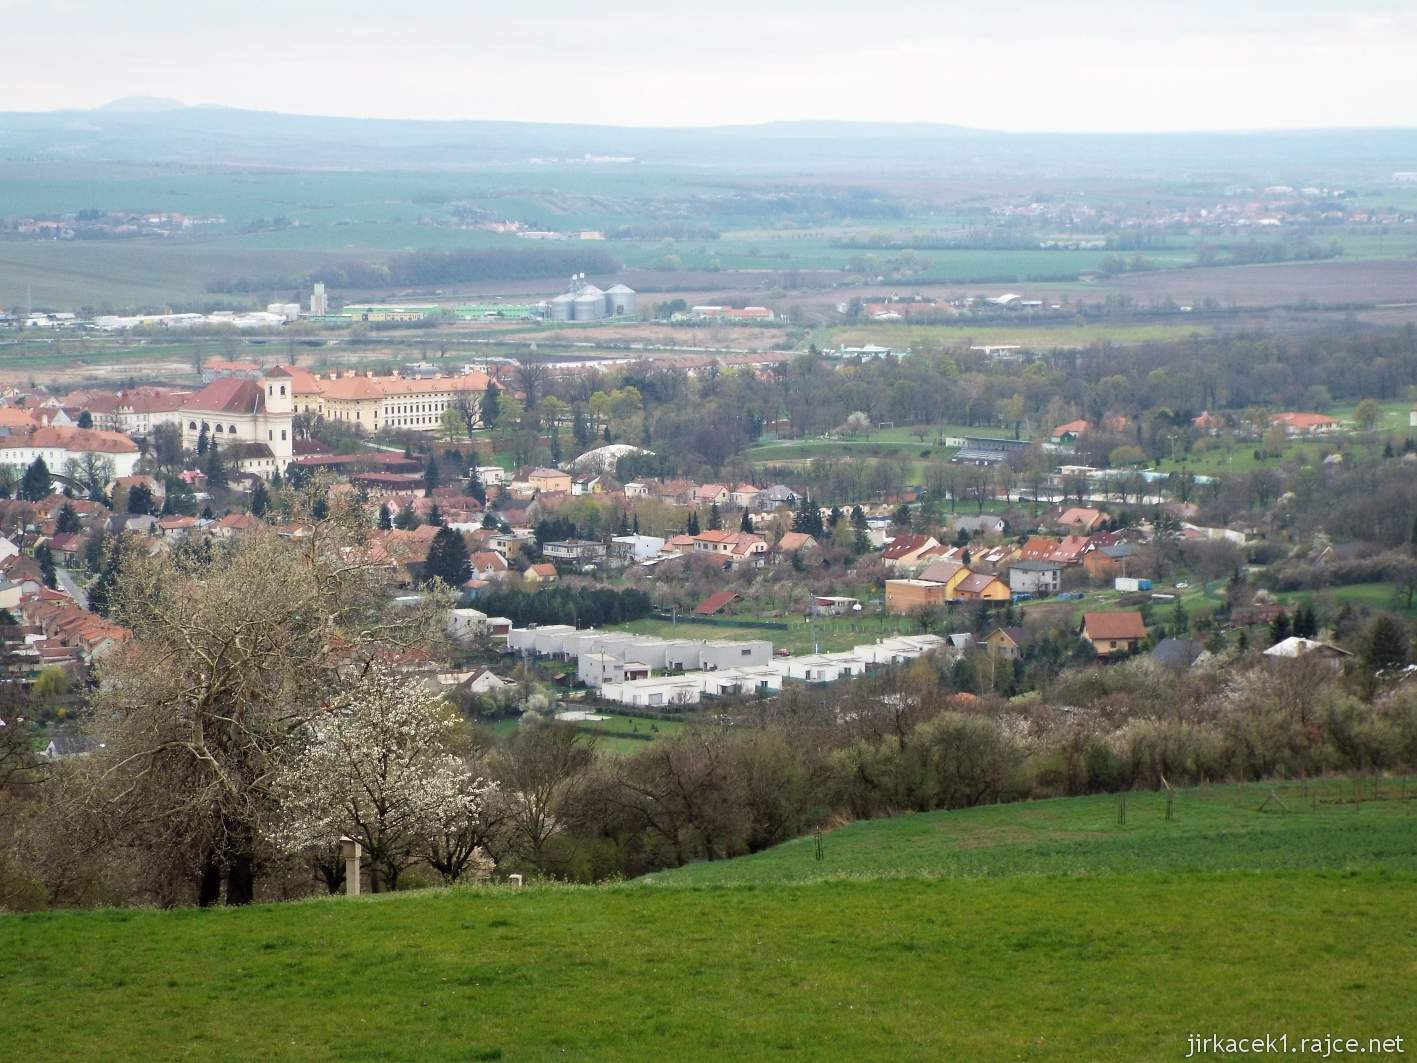 Slavkov u Brna - kaple sv. Urbana - výhled od kaple na město Slavkov